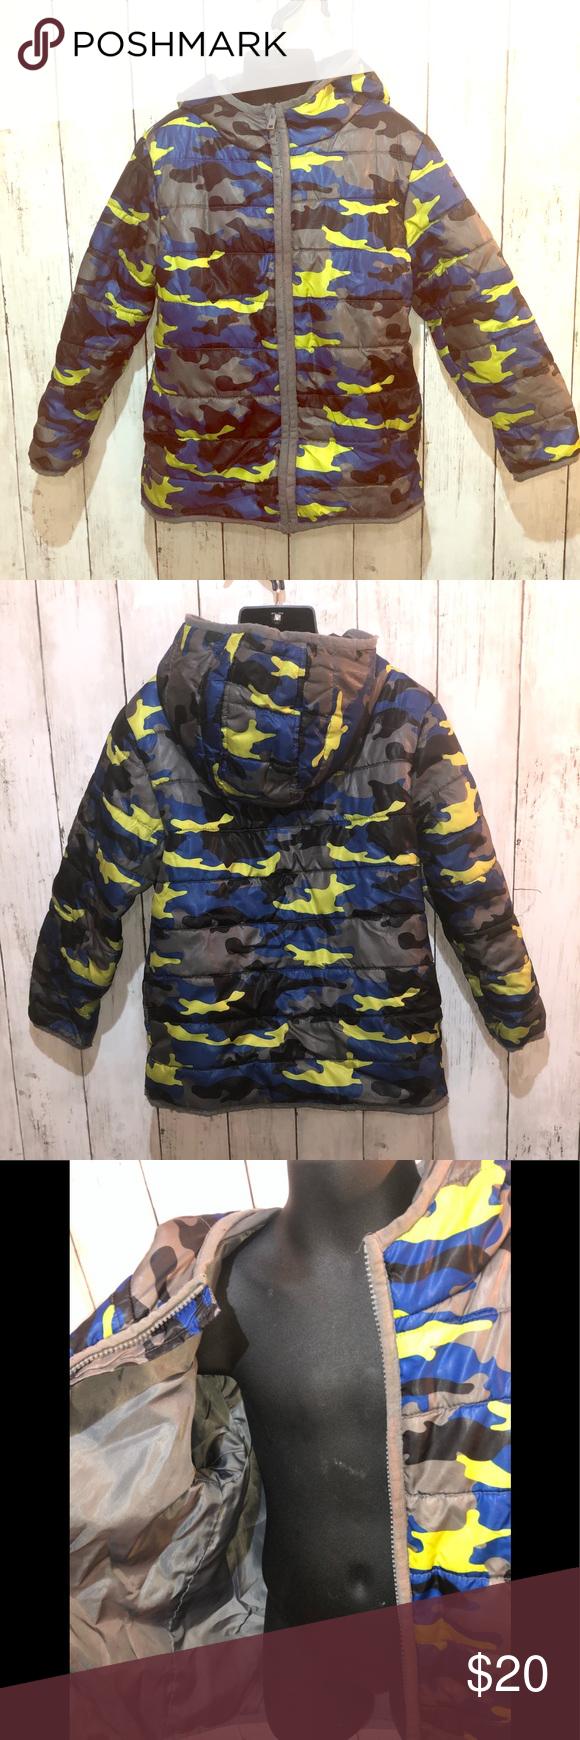 3 25 Gymboree Camo Puffer Jacket S 5 6 Floral Romper Pants Camo Puffer Jacket Baby Girl Jackets [ 1740 x 580 Pixel ]